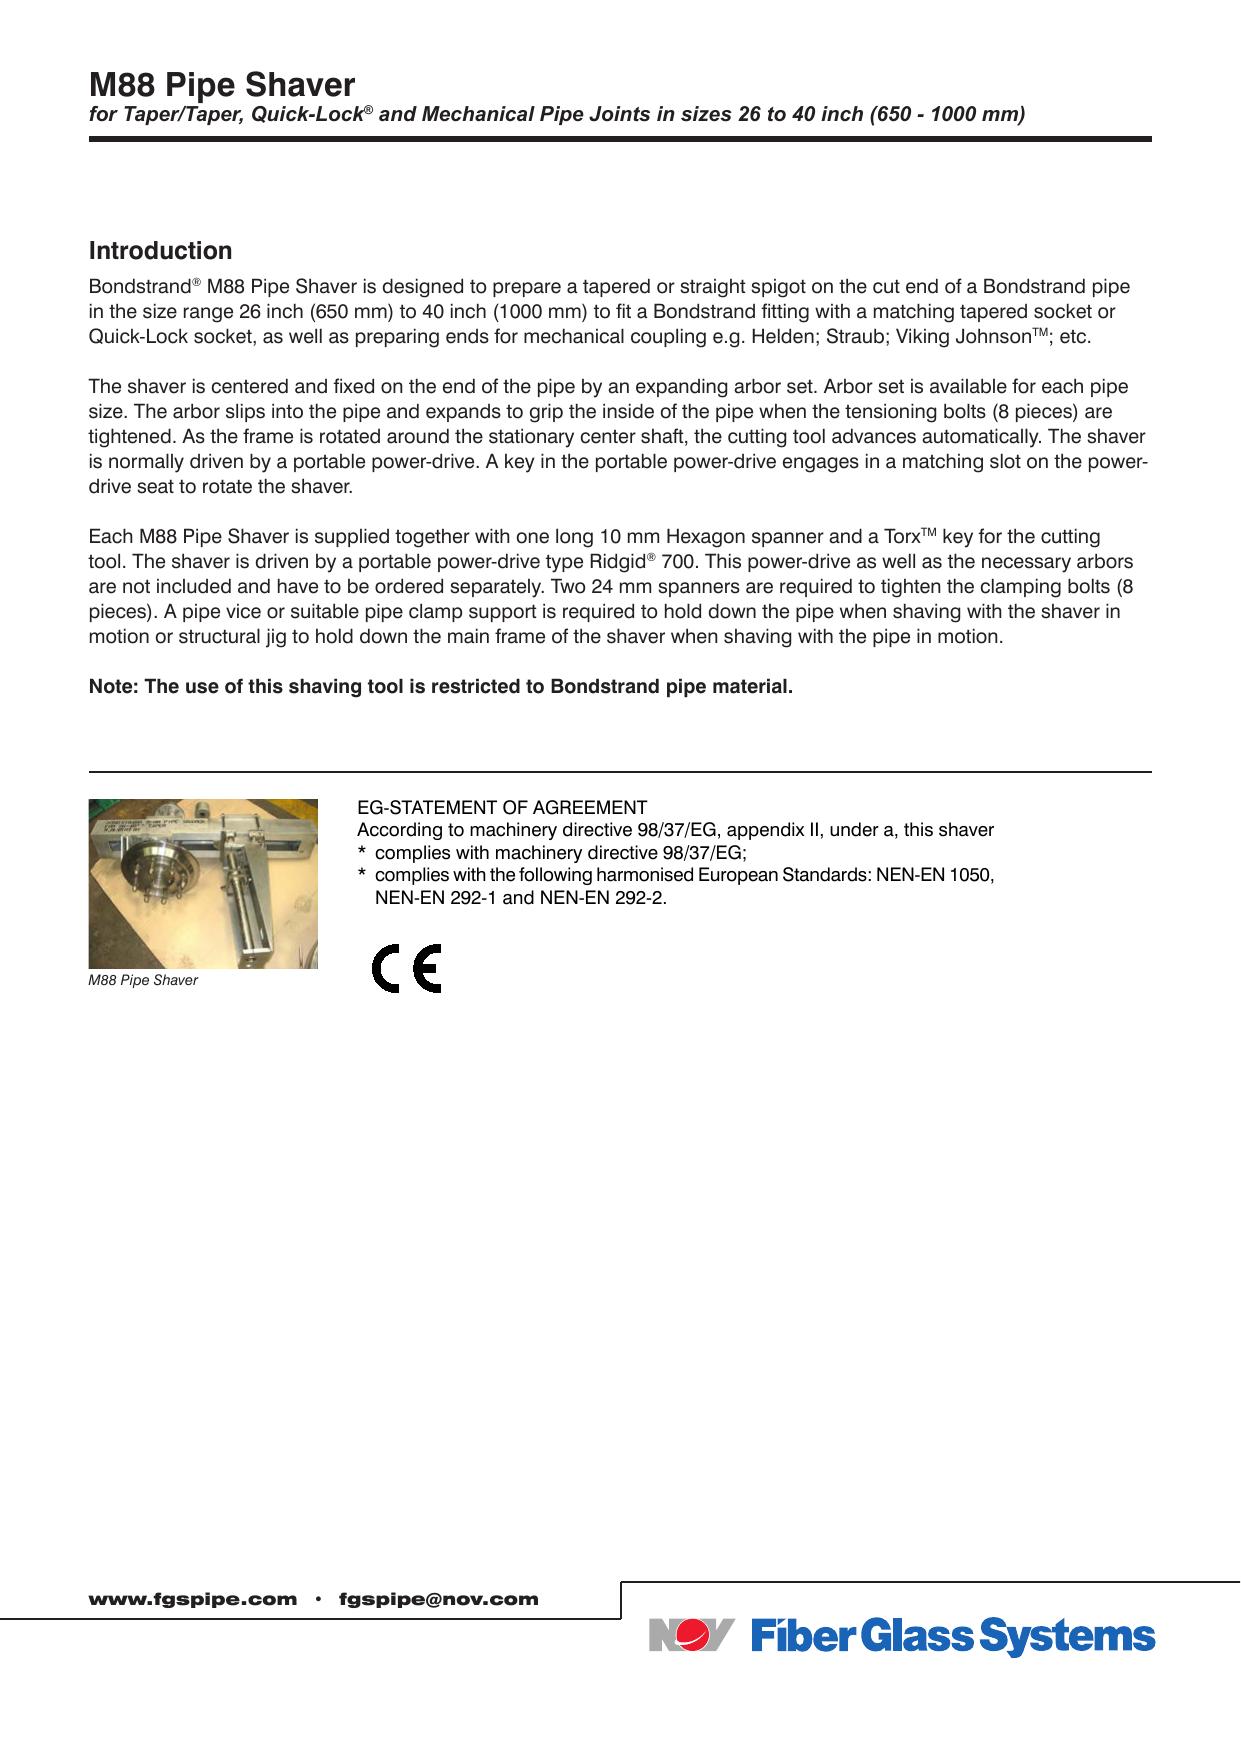 M88 Pipe Shaver - National Oilwell Varco | manualzz com